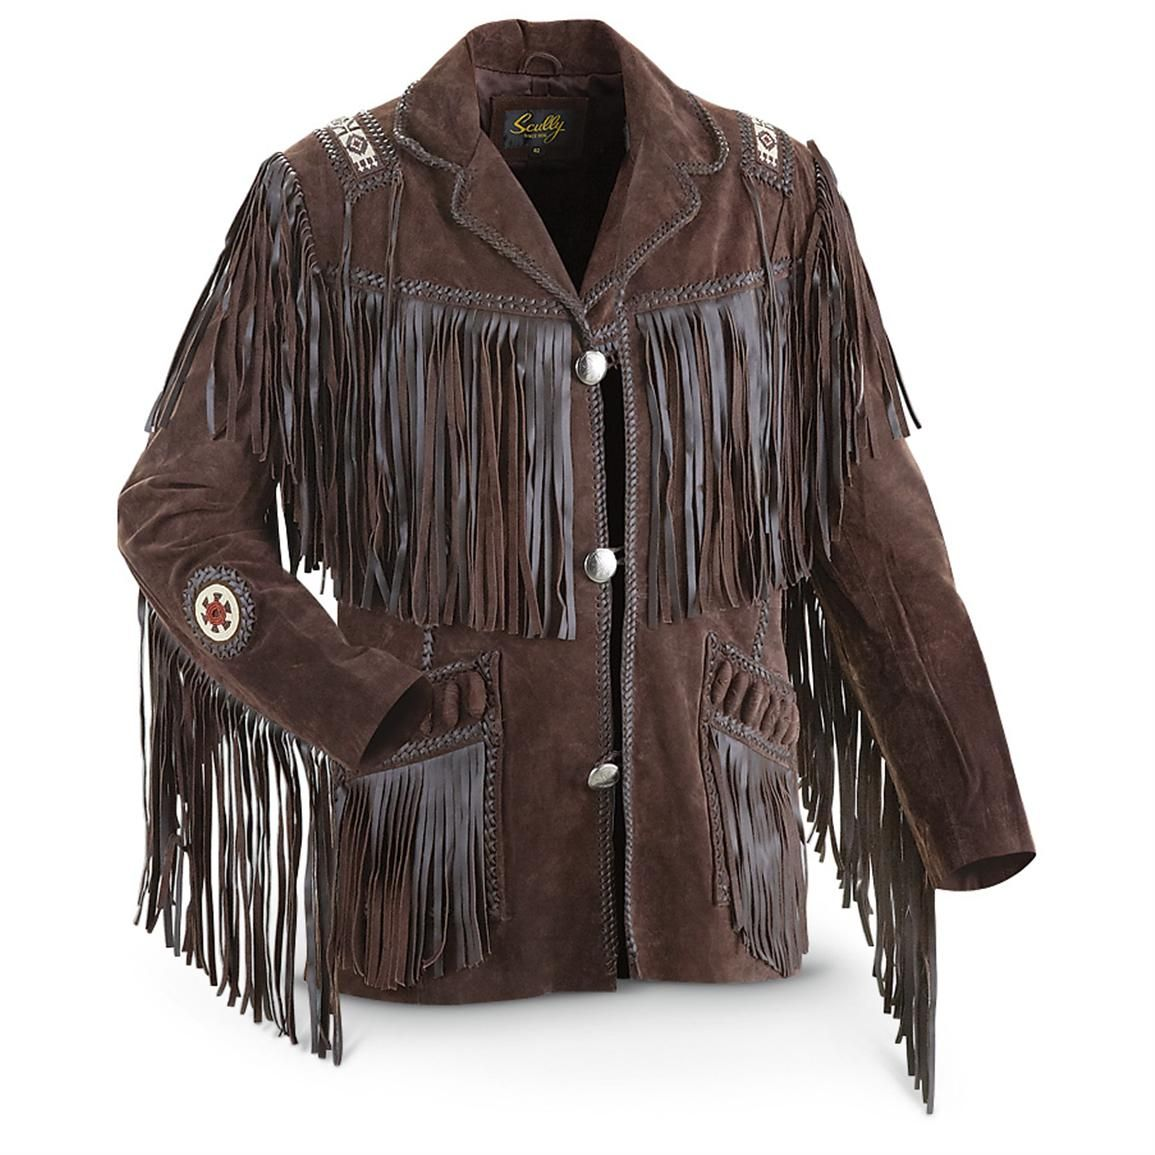 Leather jacket with fringe - Scully Fringe Western Jacket Brown Front